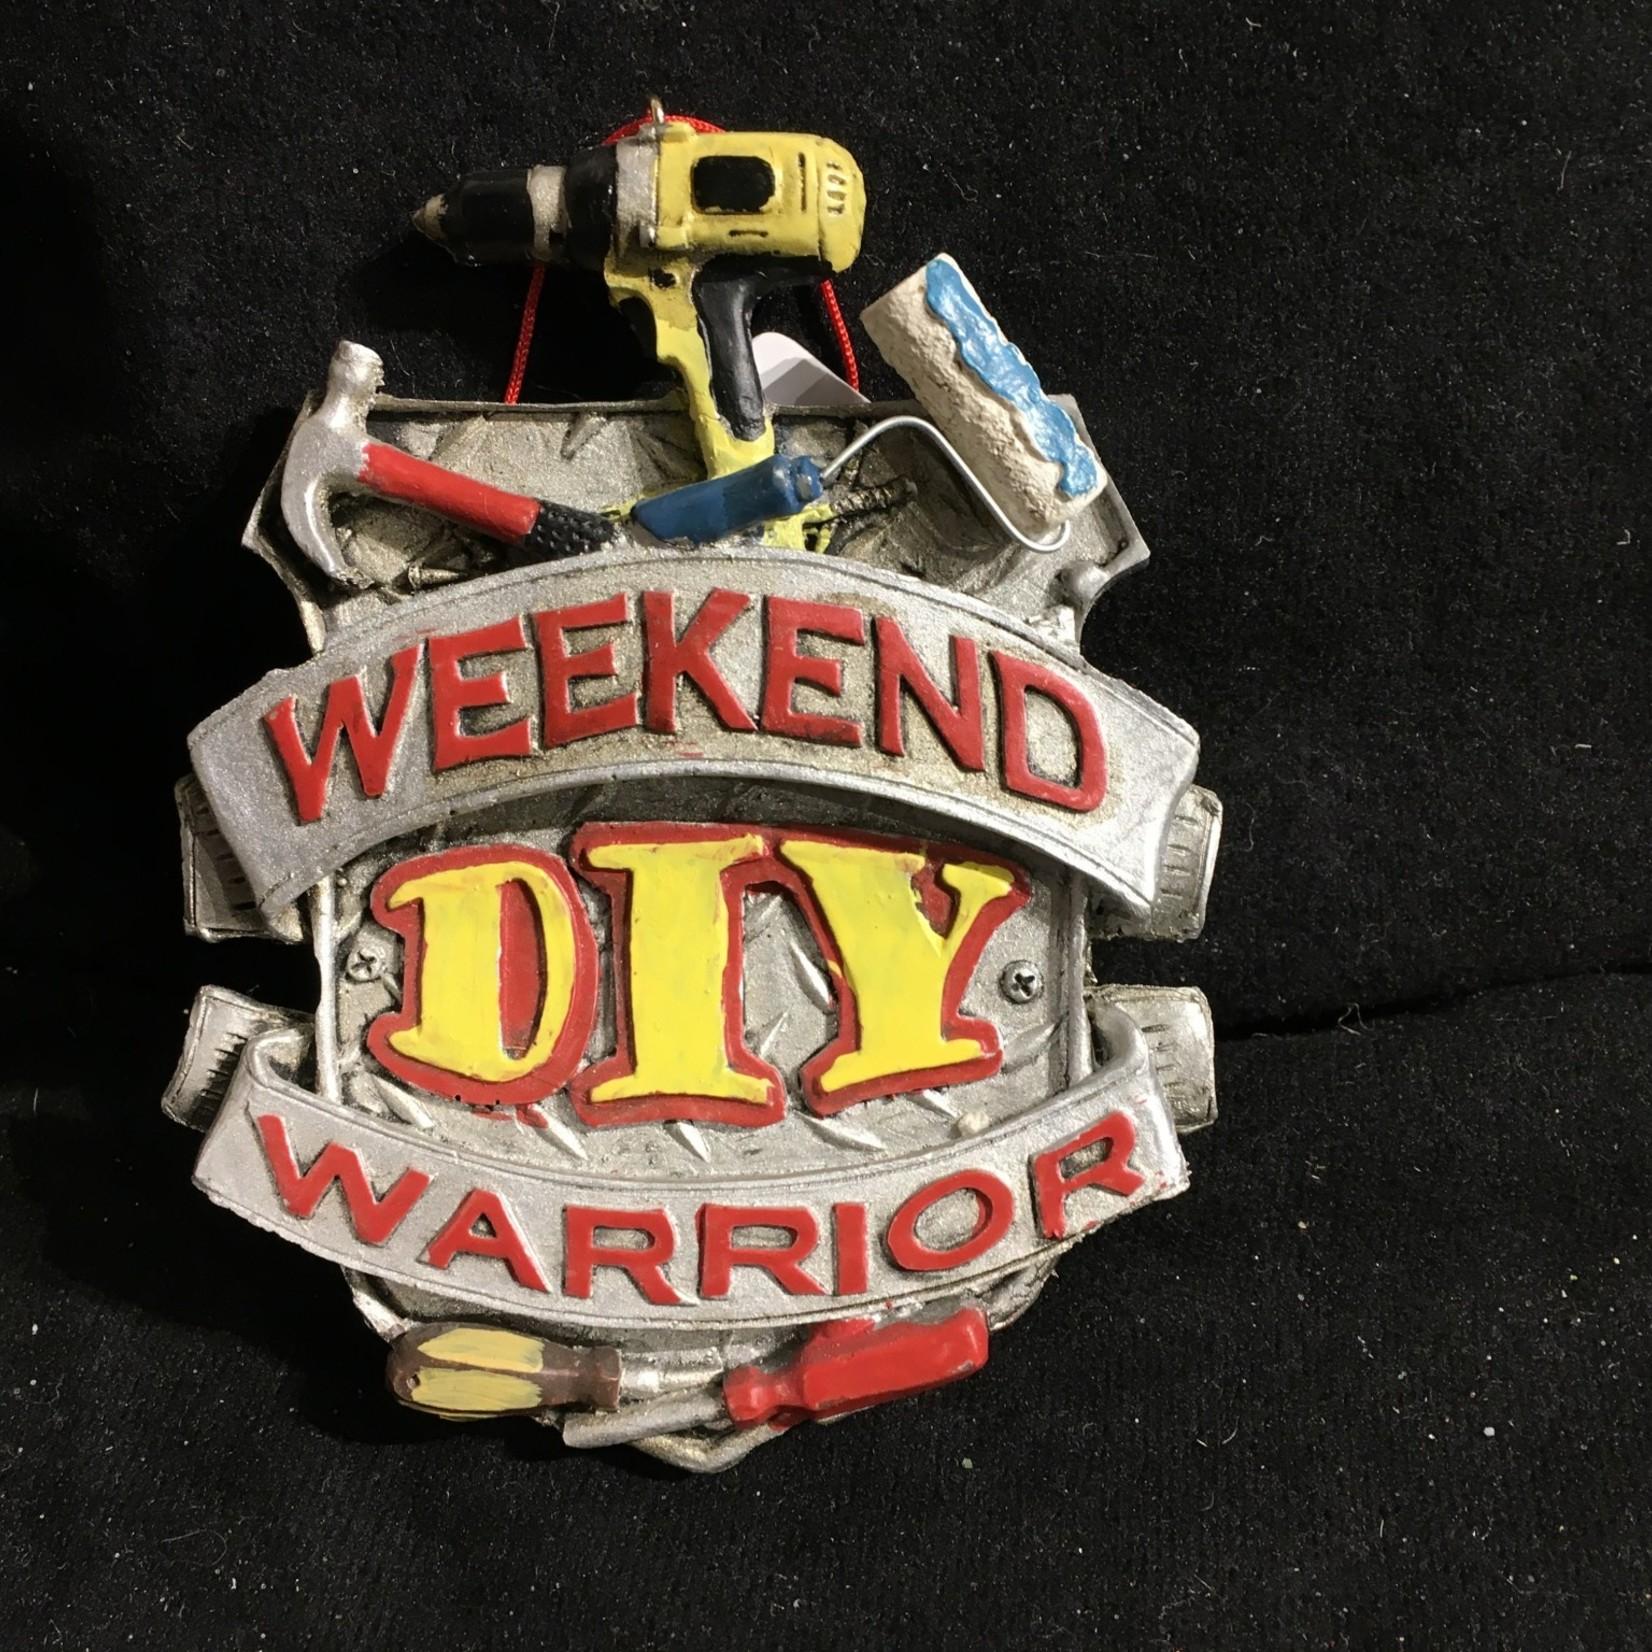 Weekend Warrior DIY Orn